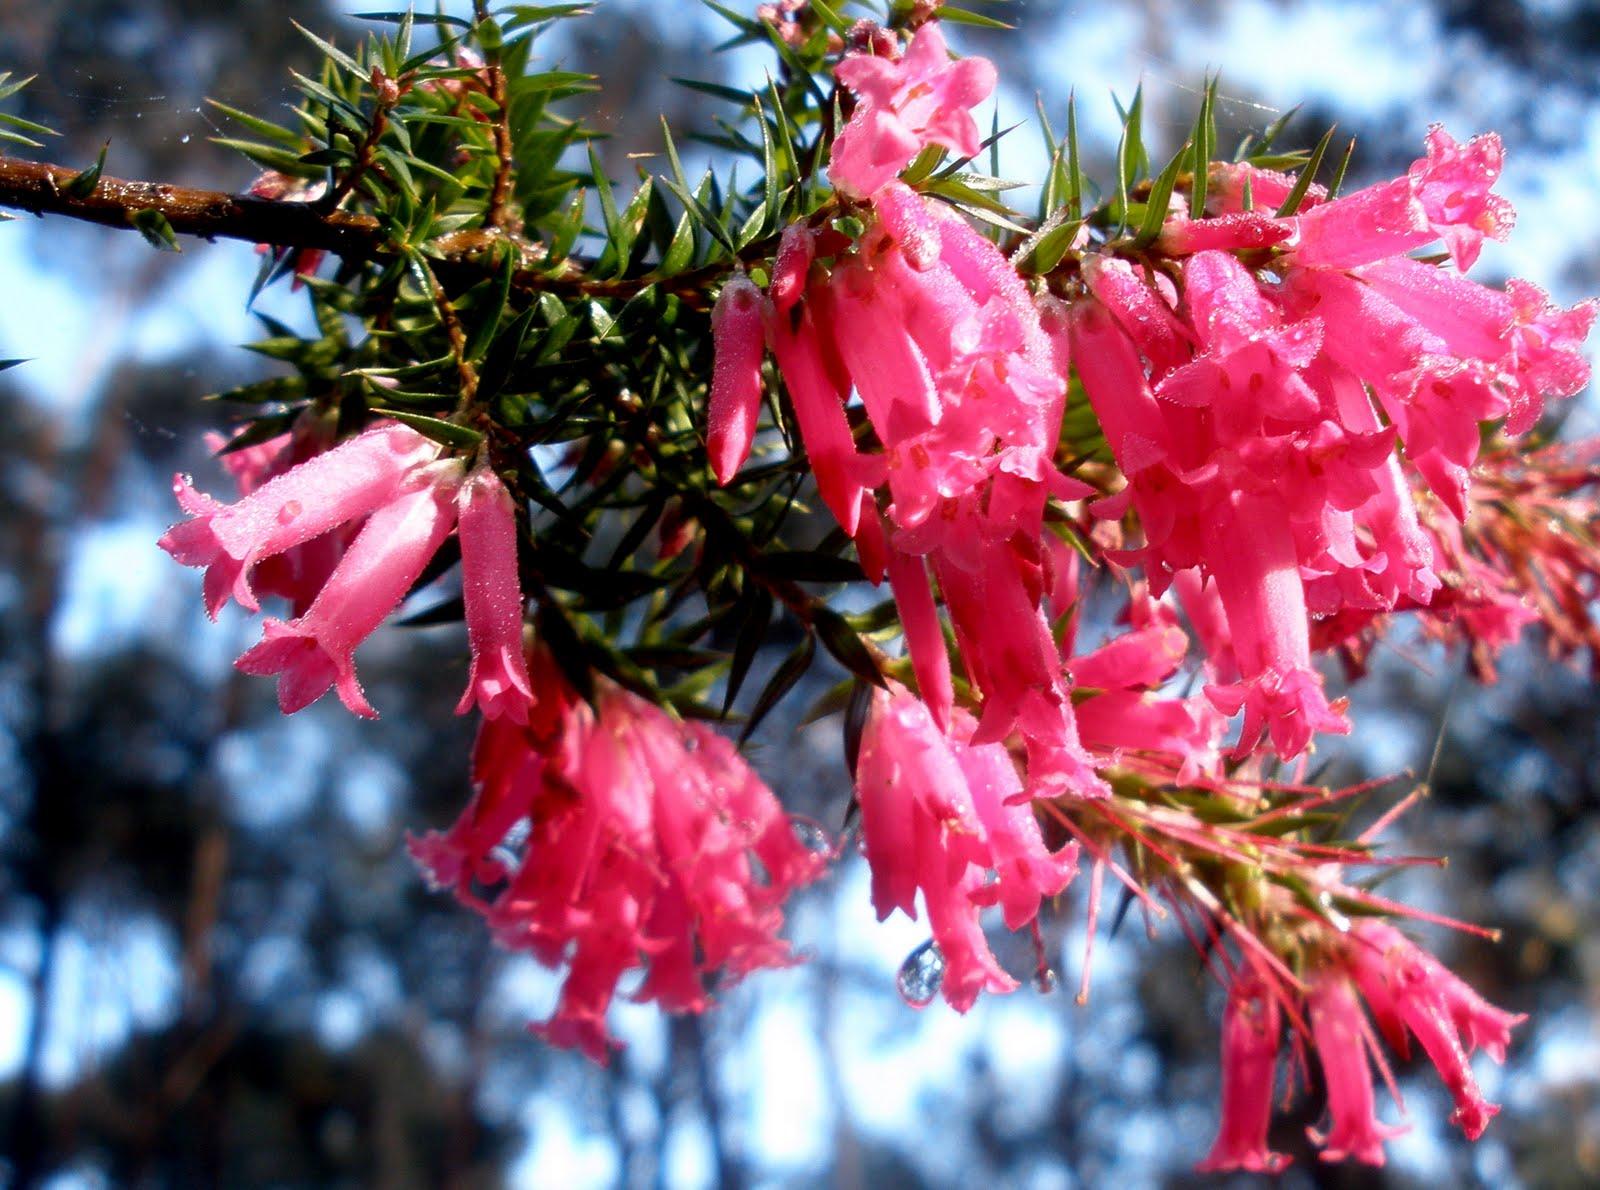 Jumping Aground Common Heath Aka Pretty Pink Flowers